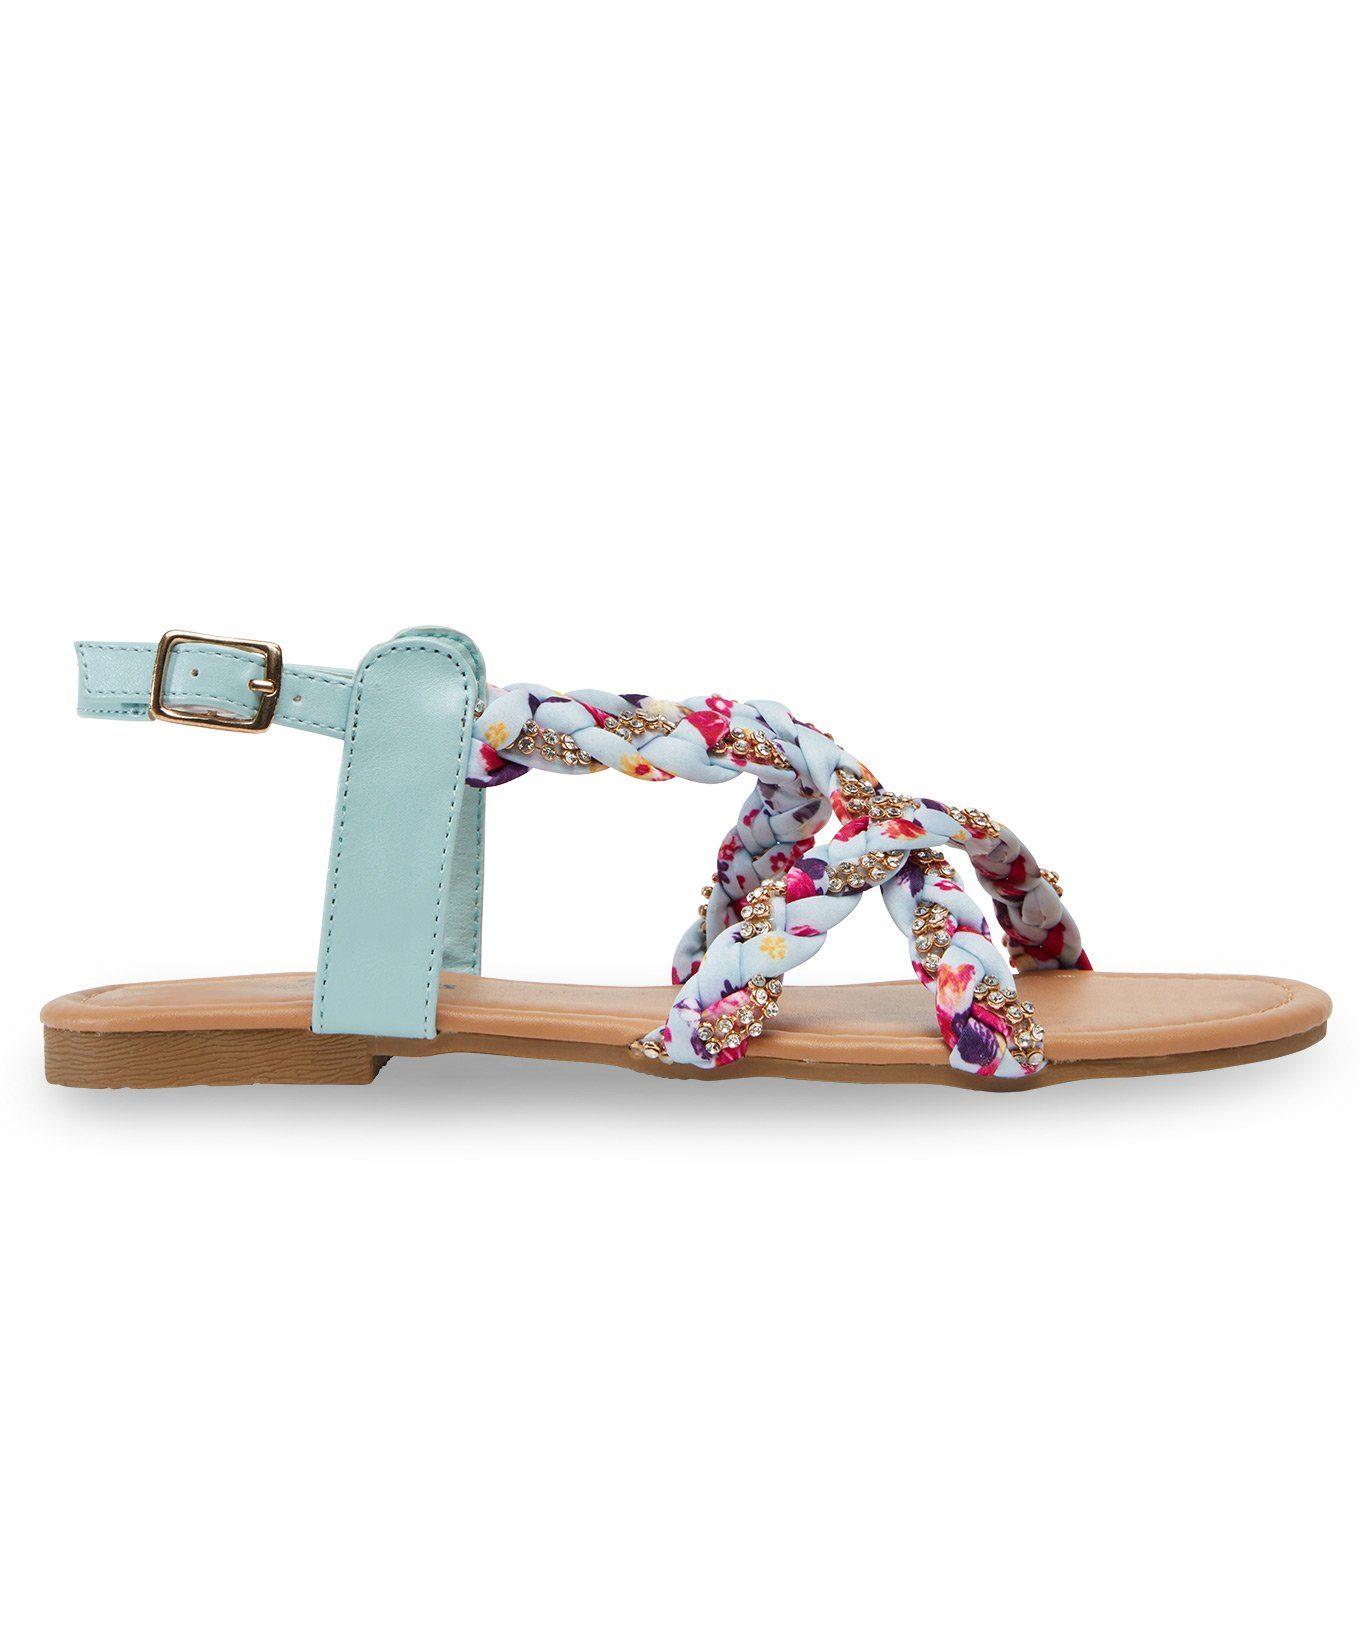 Joe Browns Sandale online kaufen  blau